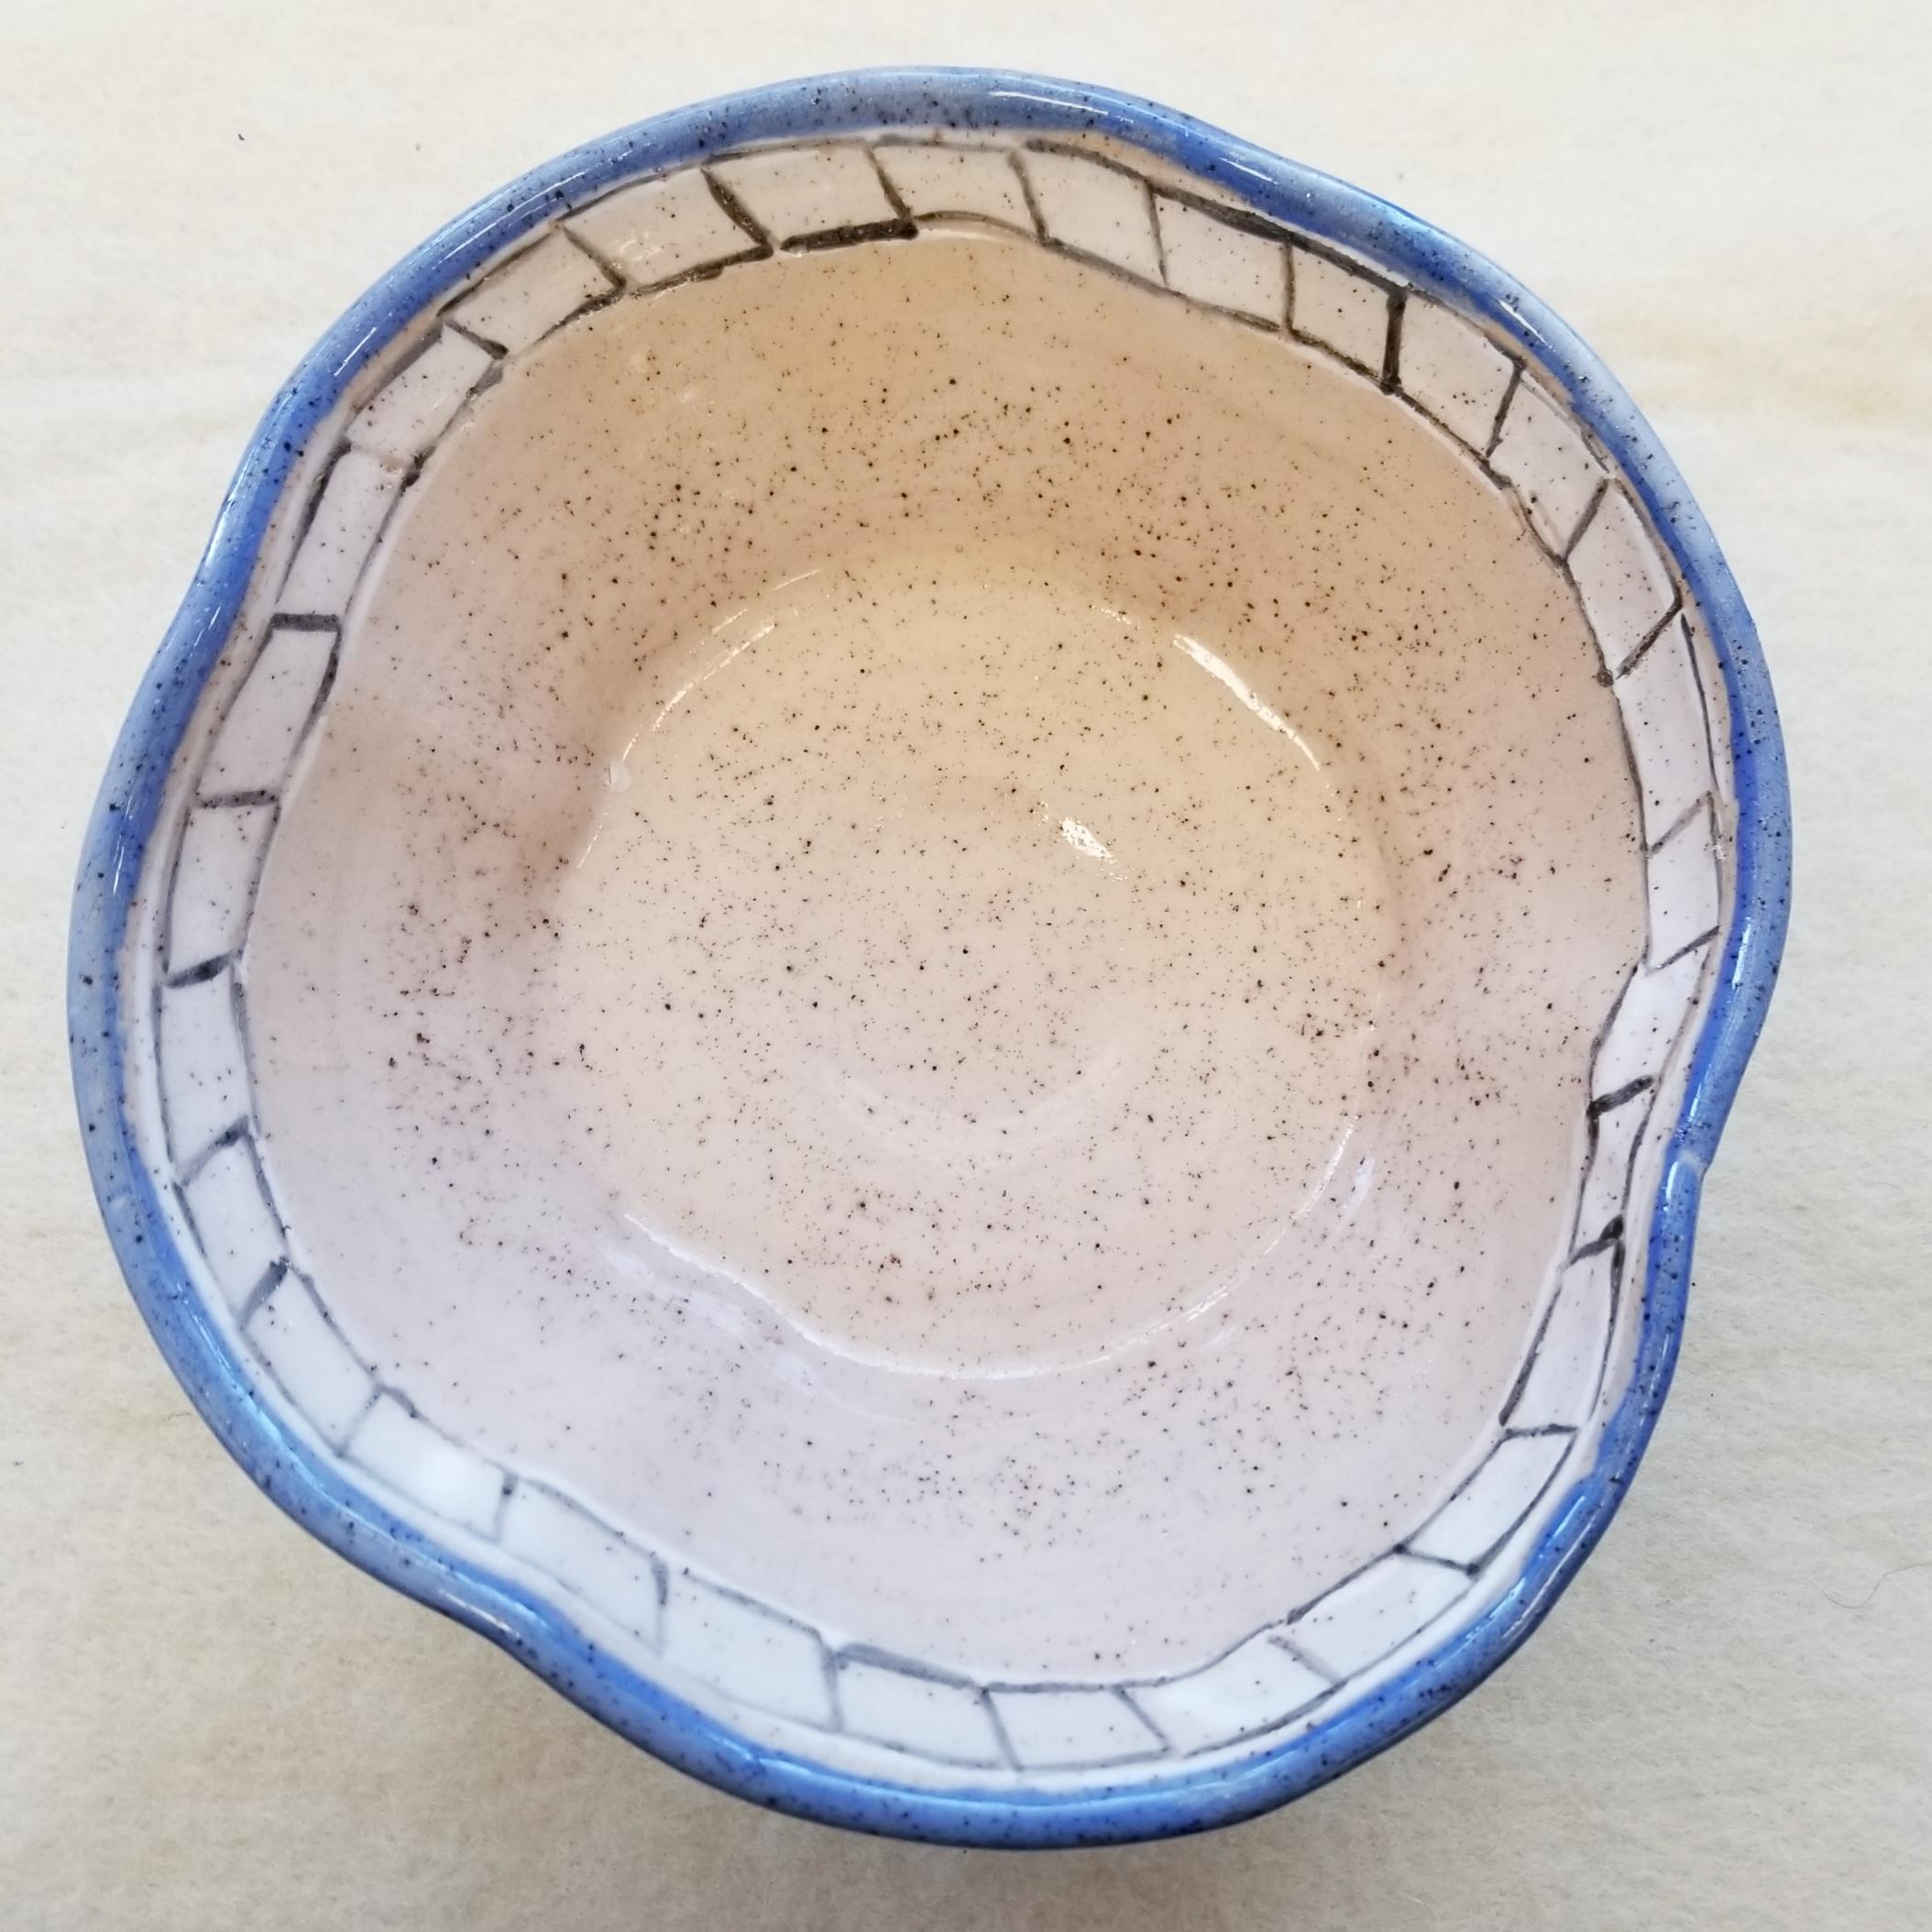 79-9 inch Bowl, Tri-Tone Decorated